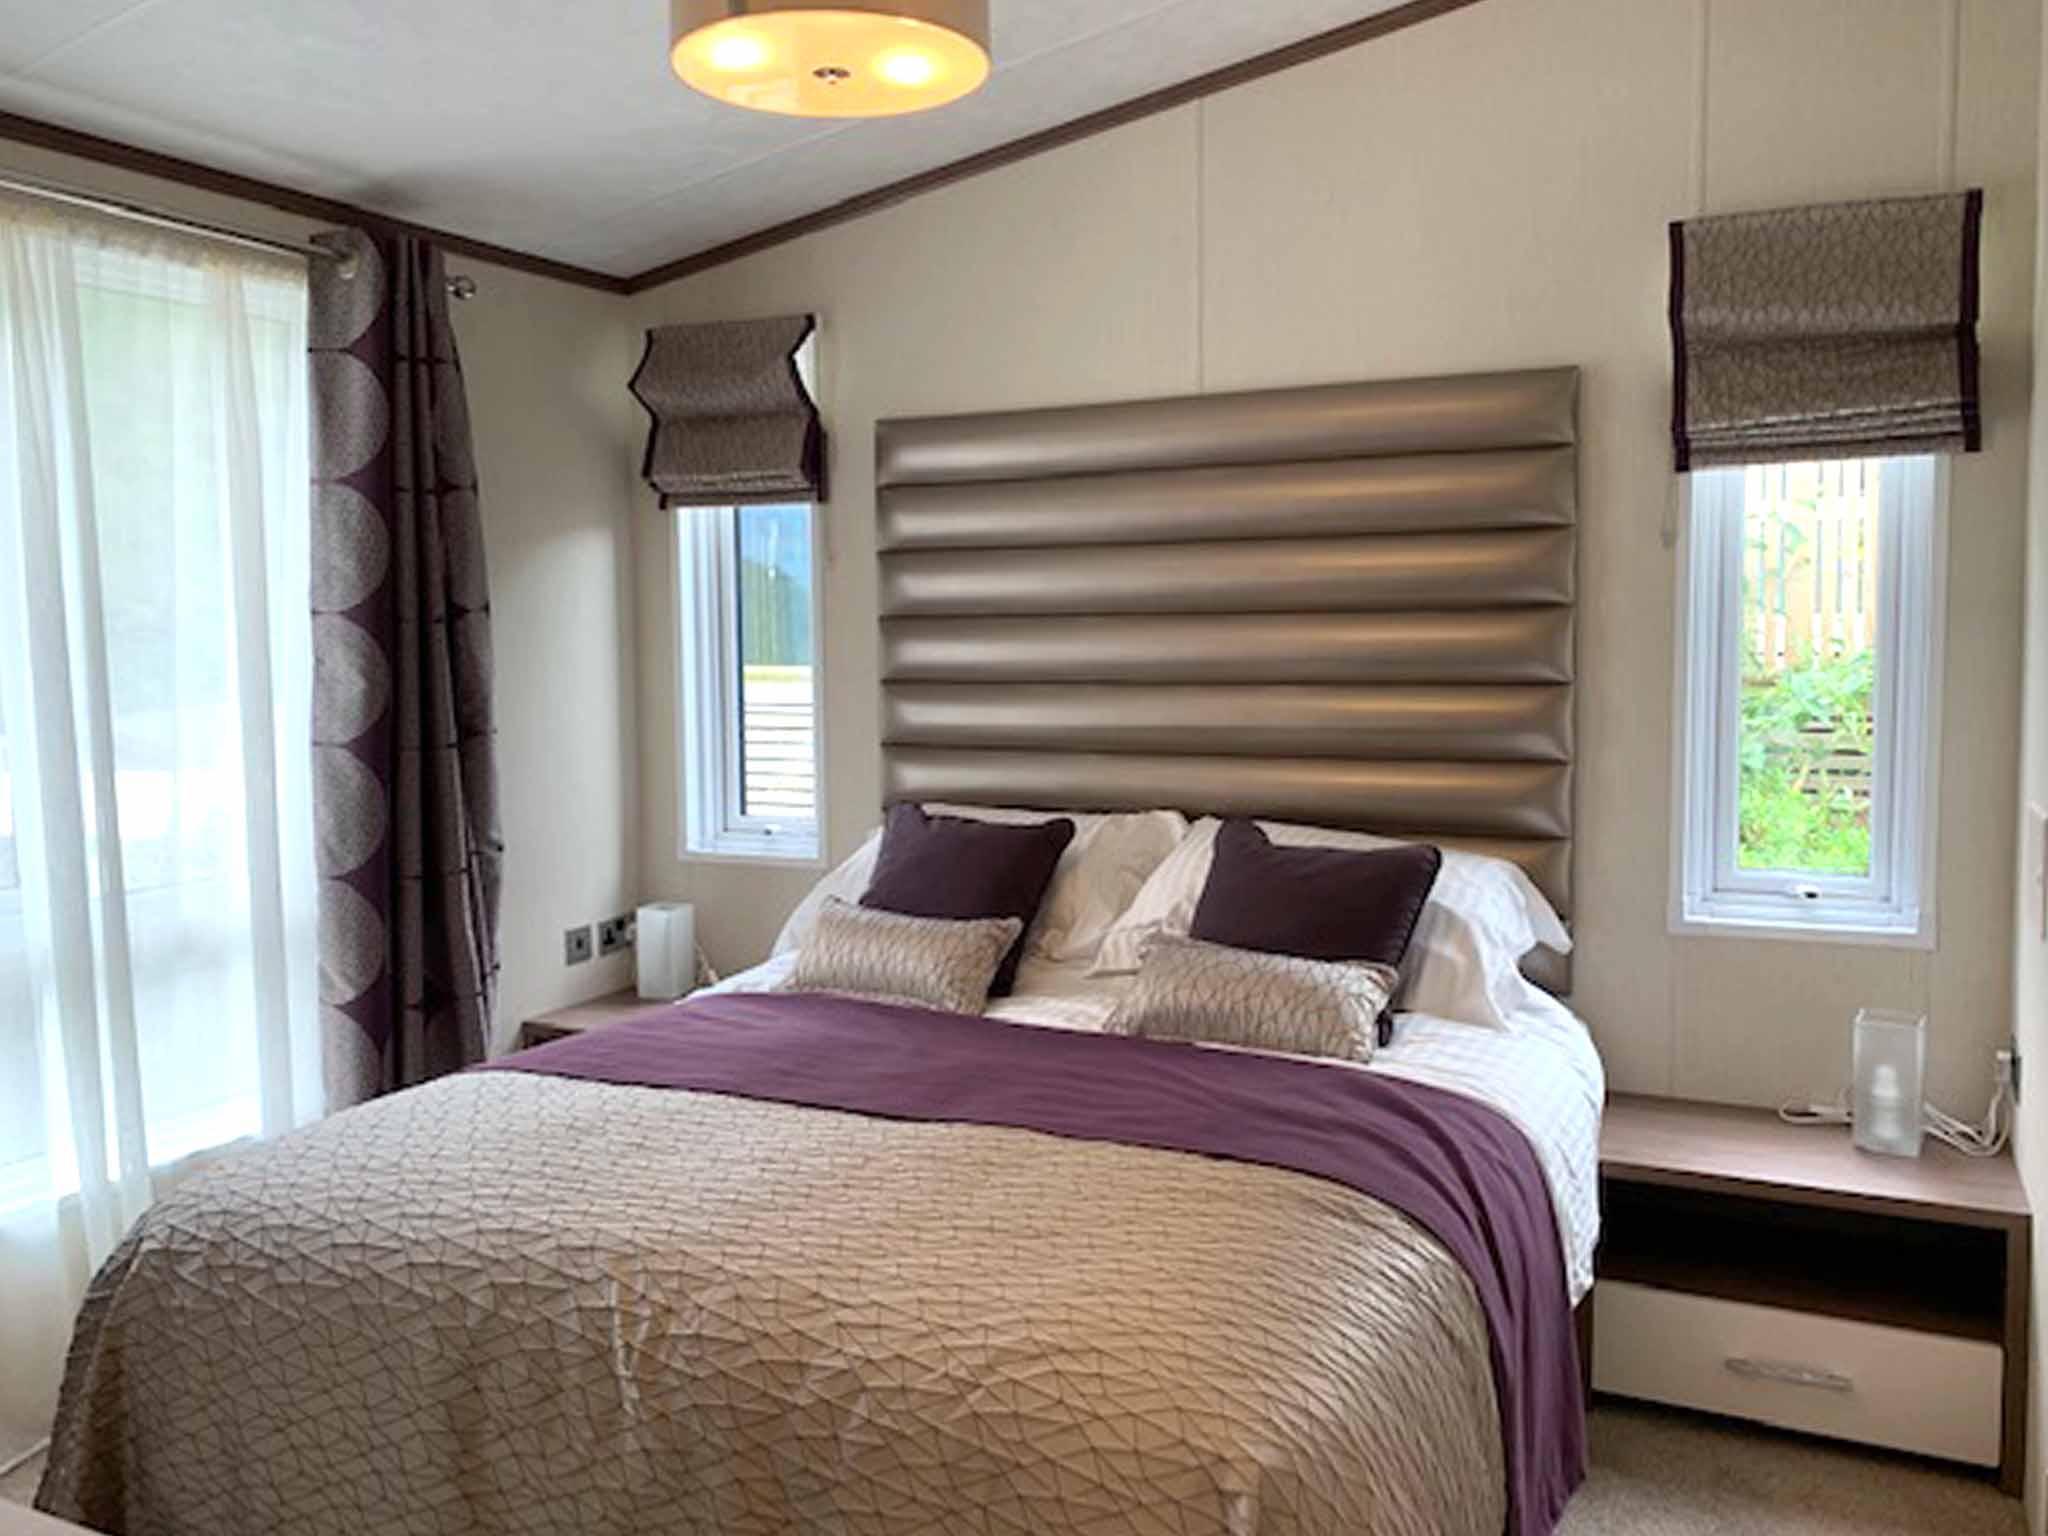 Pemberton Arrondale lodge Master bedroom Gwalia Falls Retreat Tresaith Beach